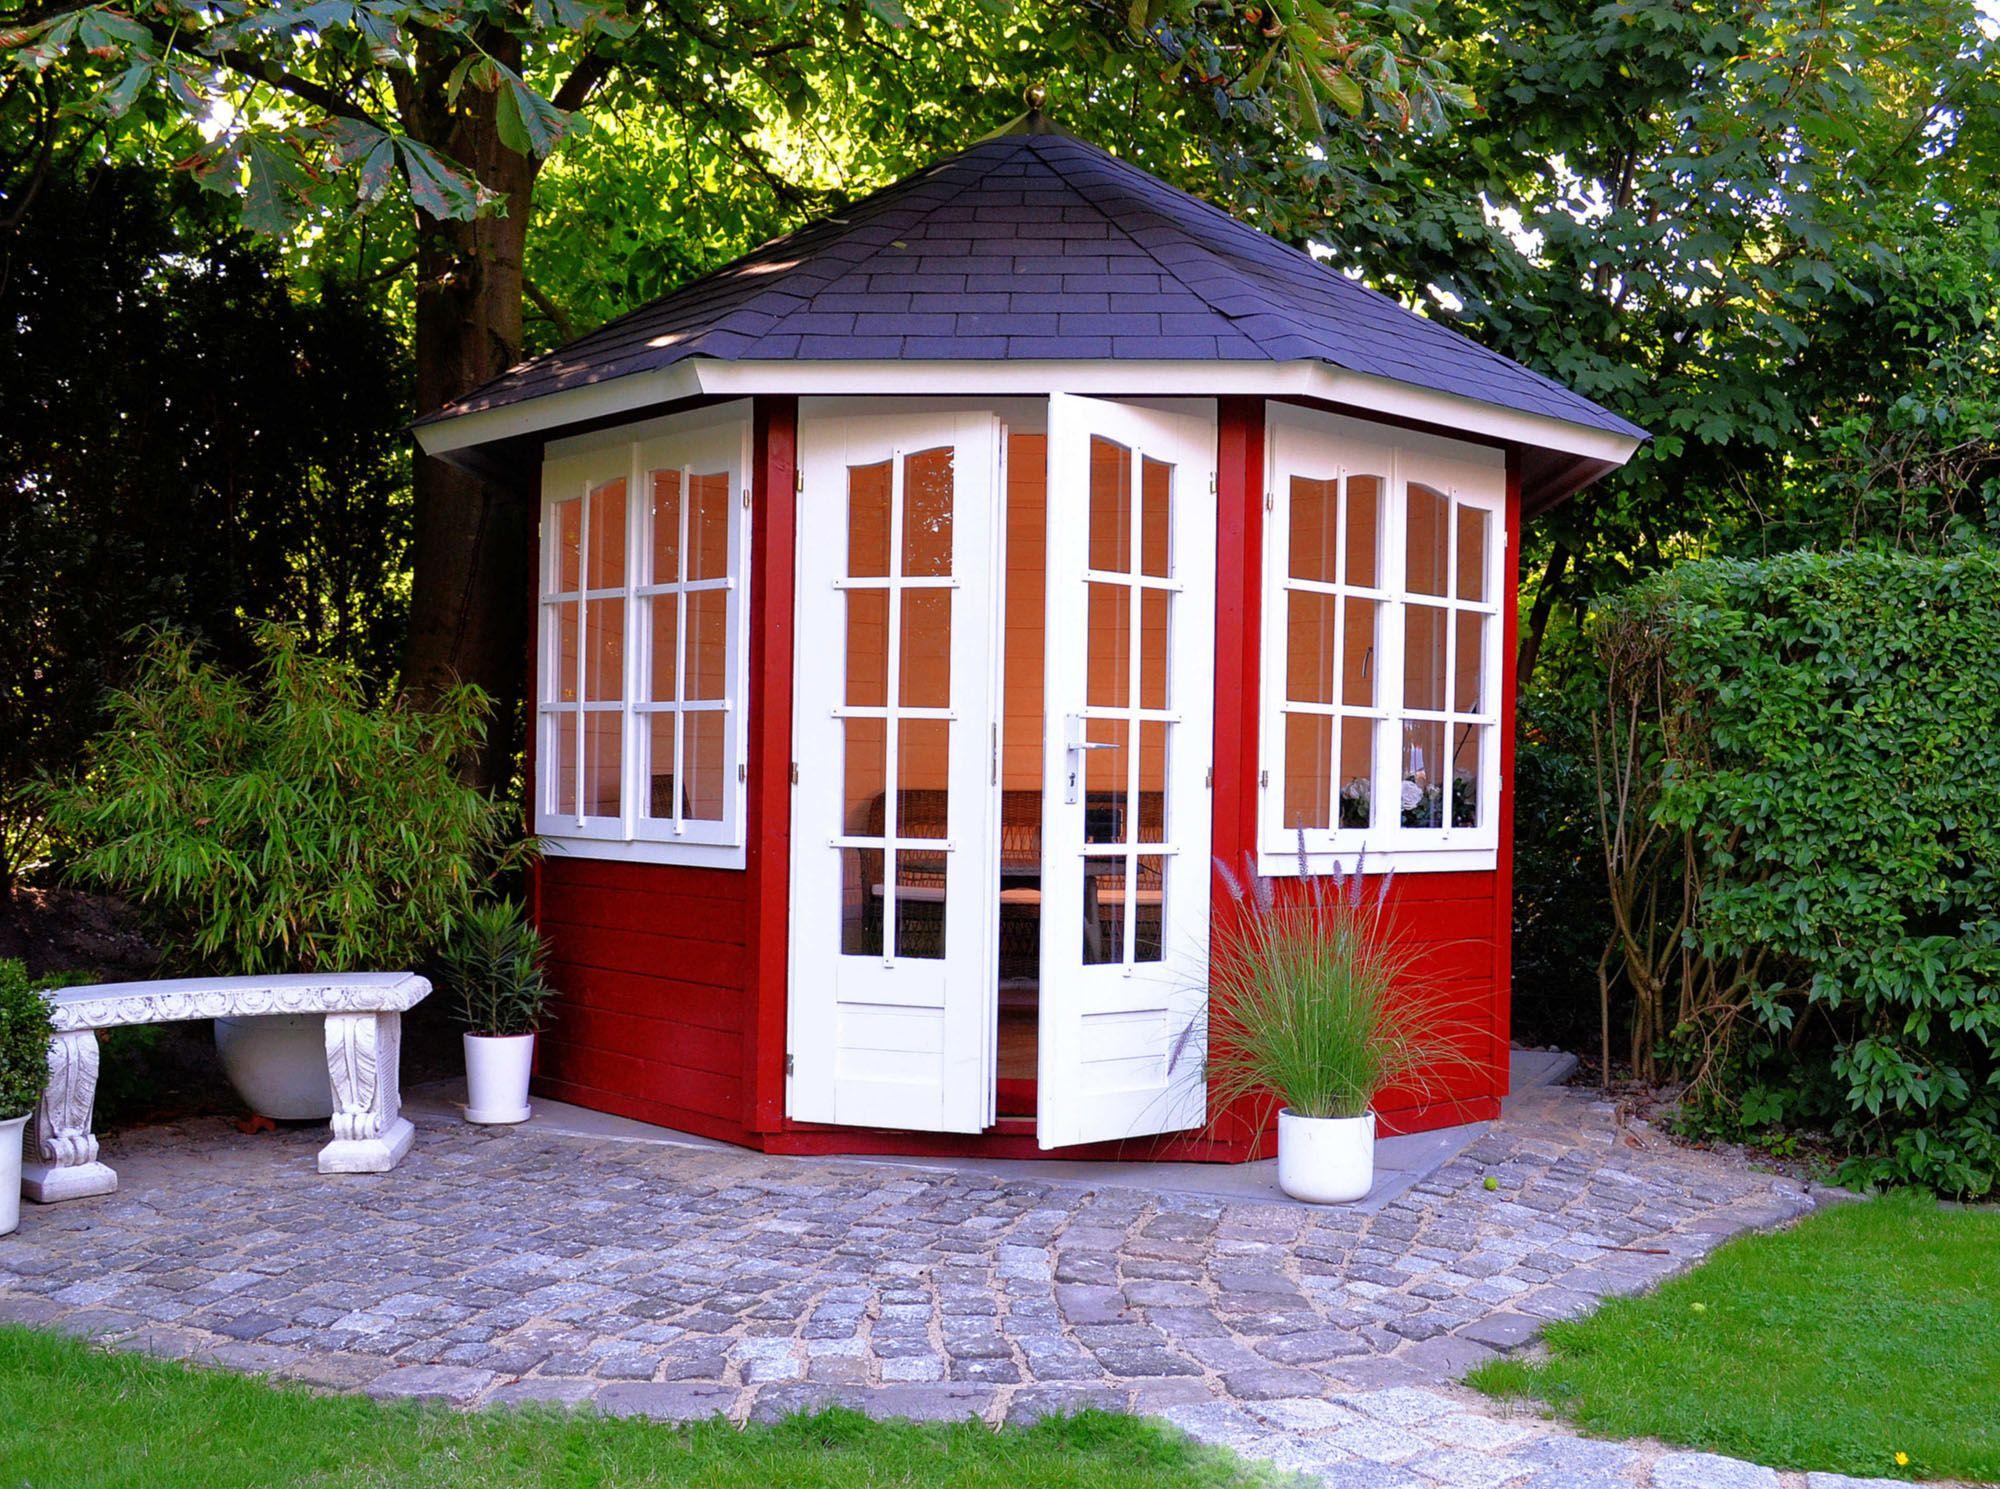 Palmako Gartenpavillon Veronica4 6,7 m² PAP2829291